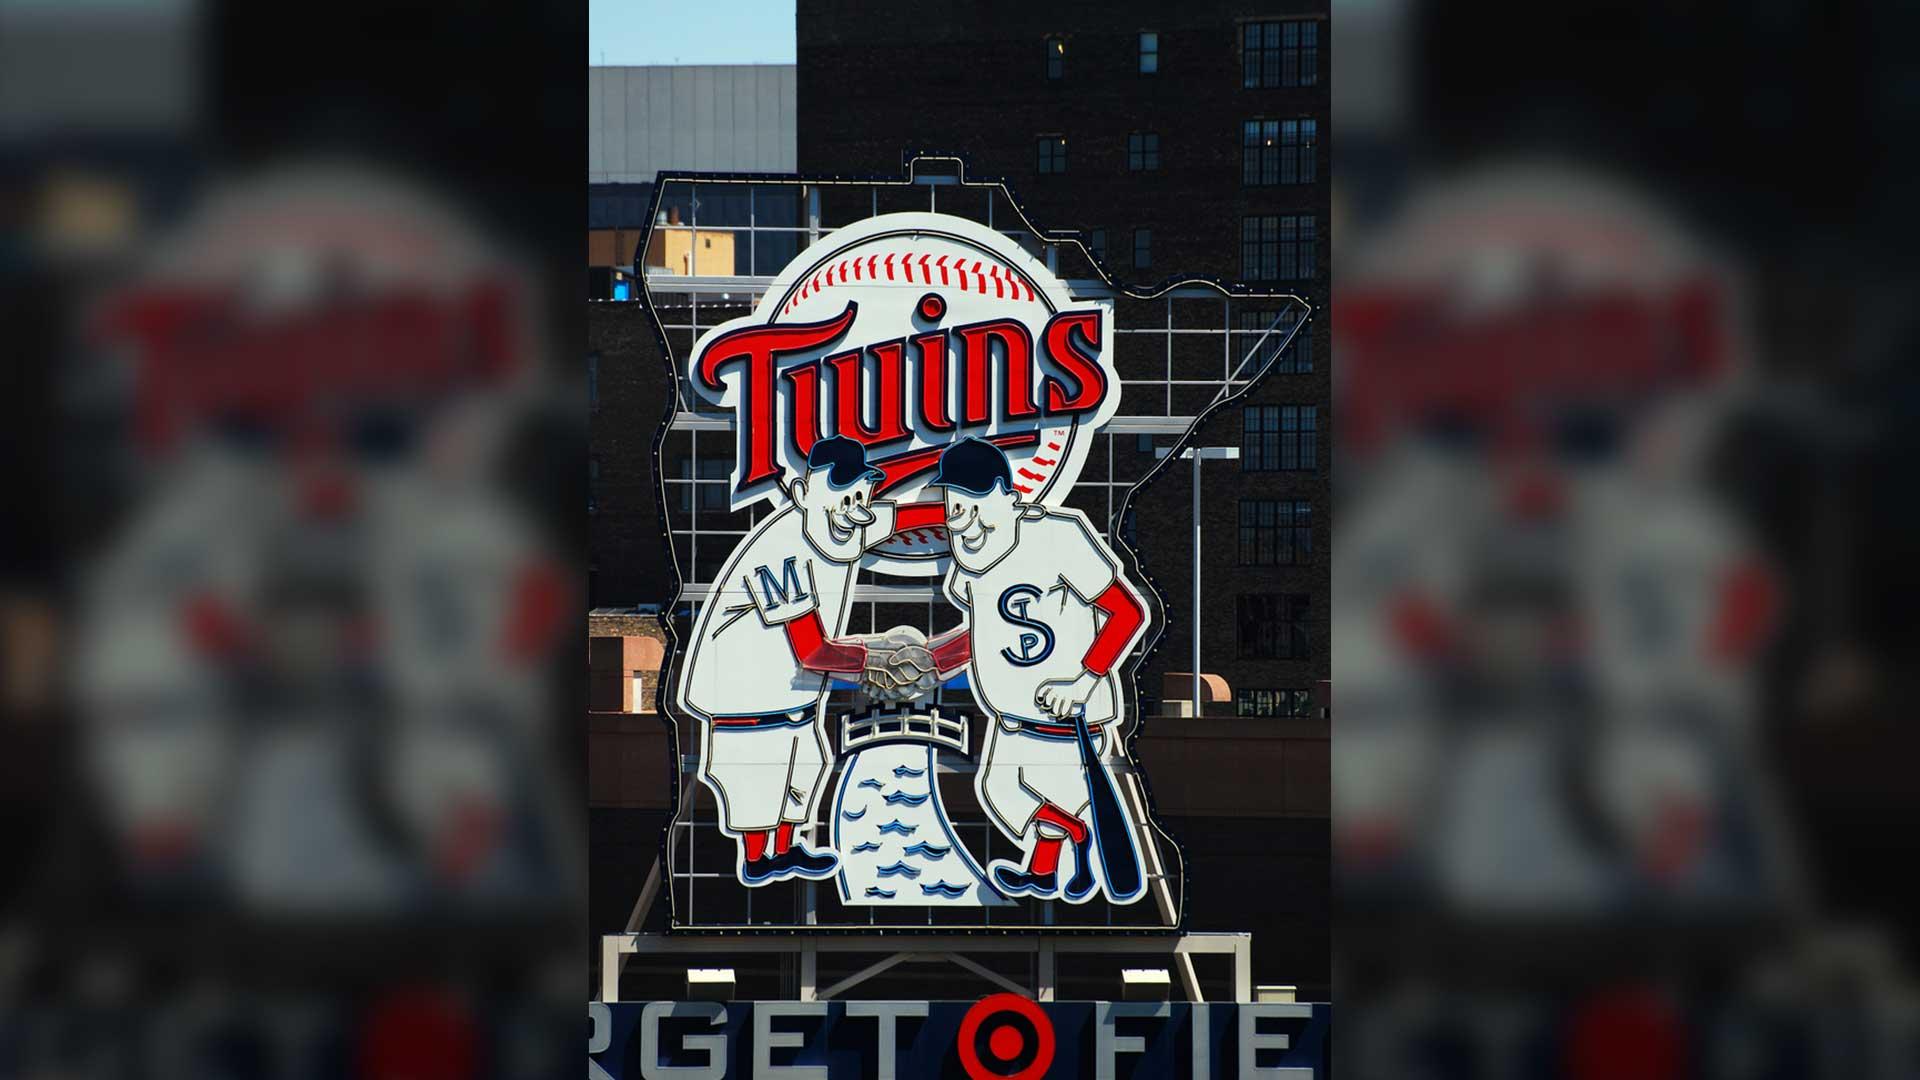 MLB--Twins-Petition-MLB-to-Add-5th-Base.jpg